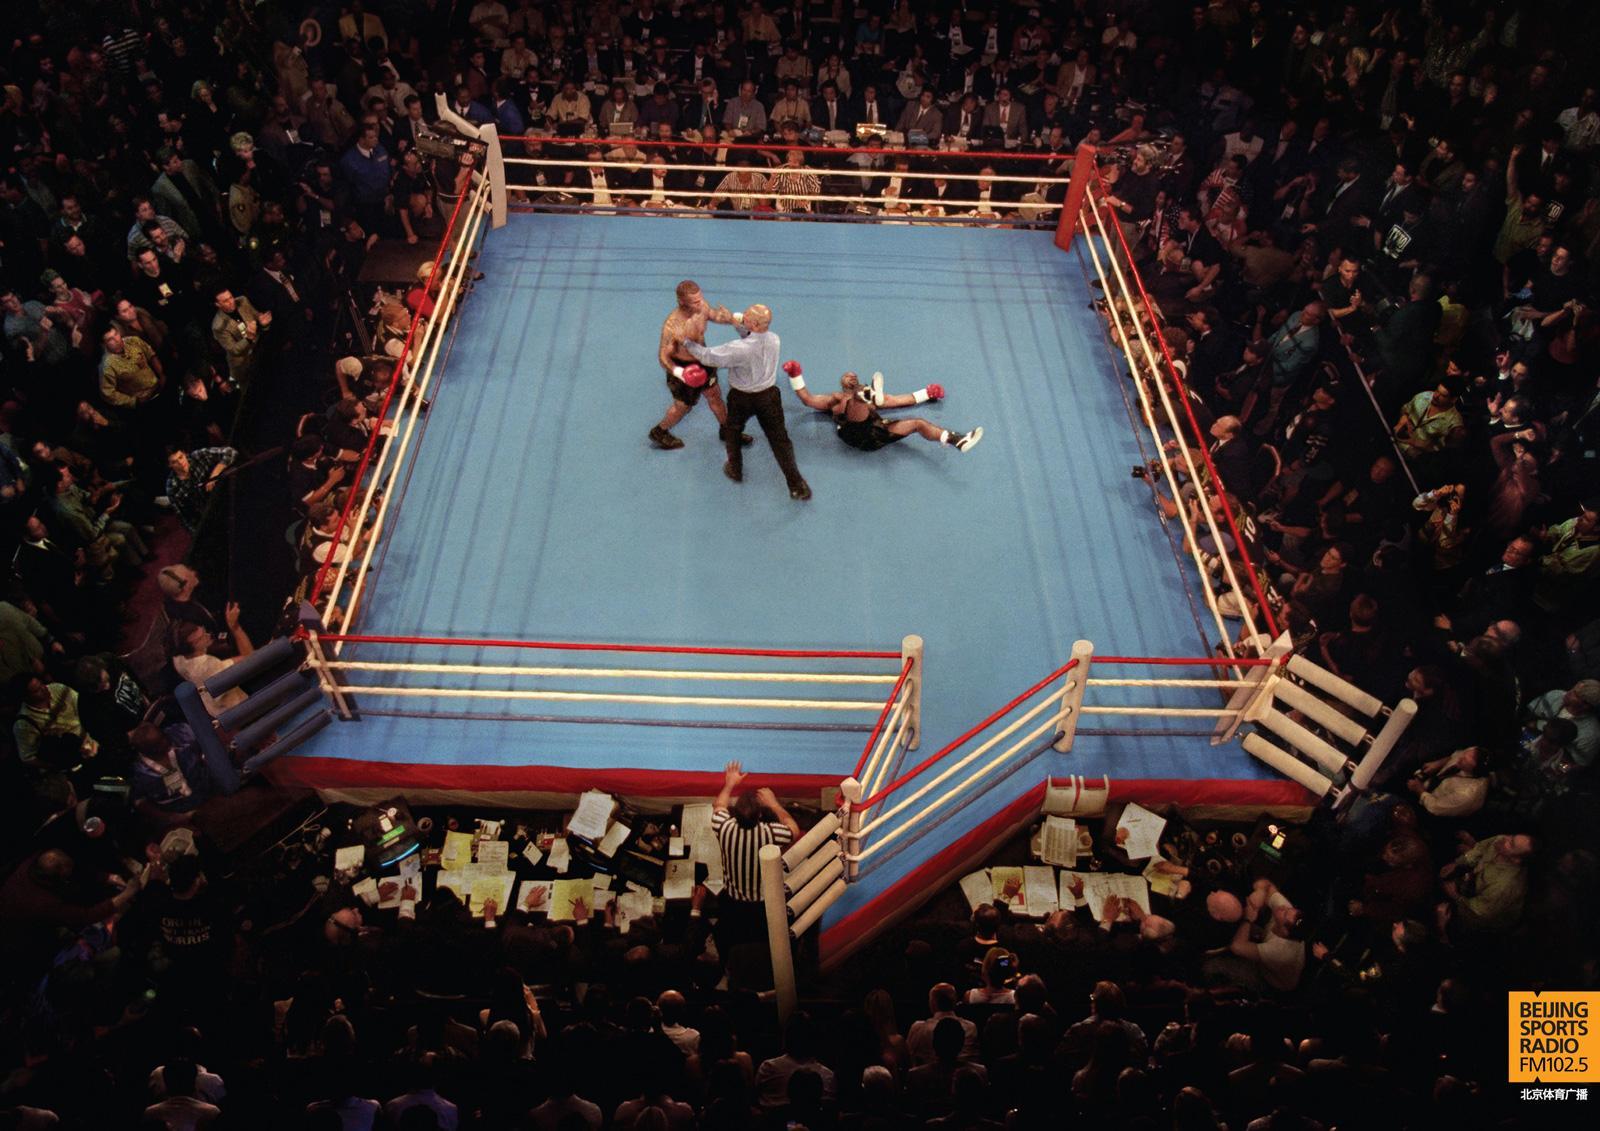 Beijing Sports Radio Print Ad -  Boxing